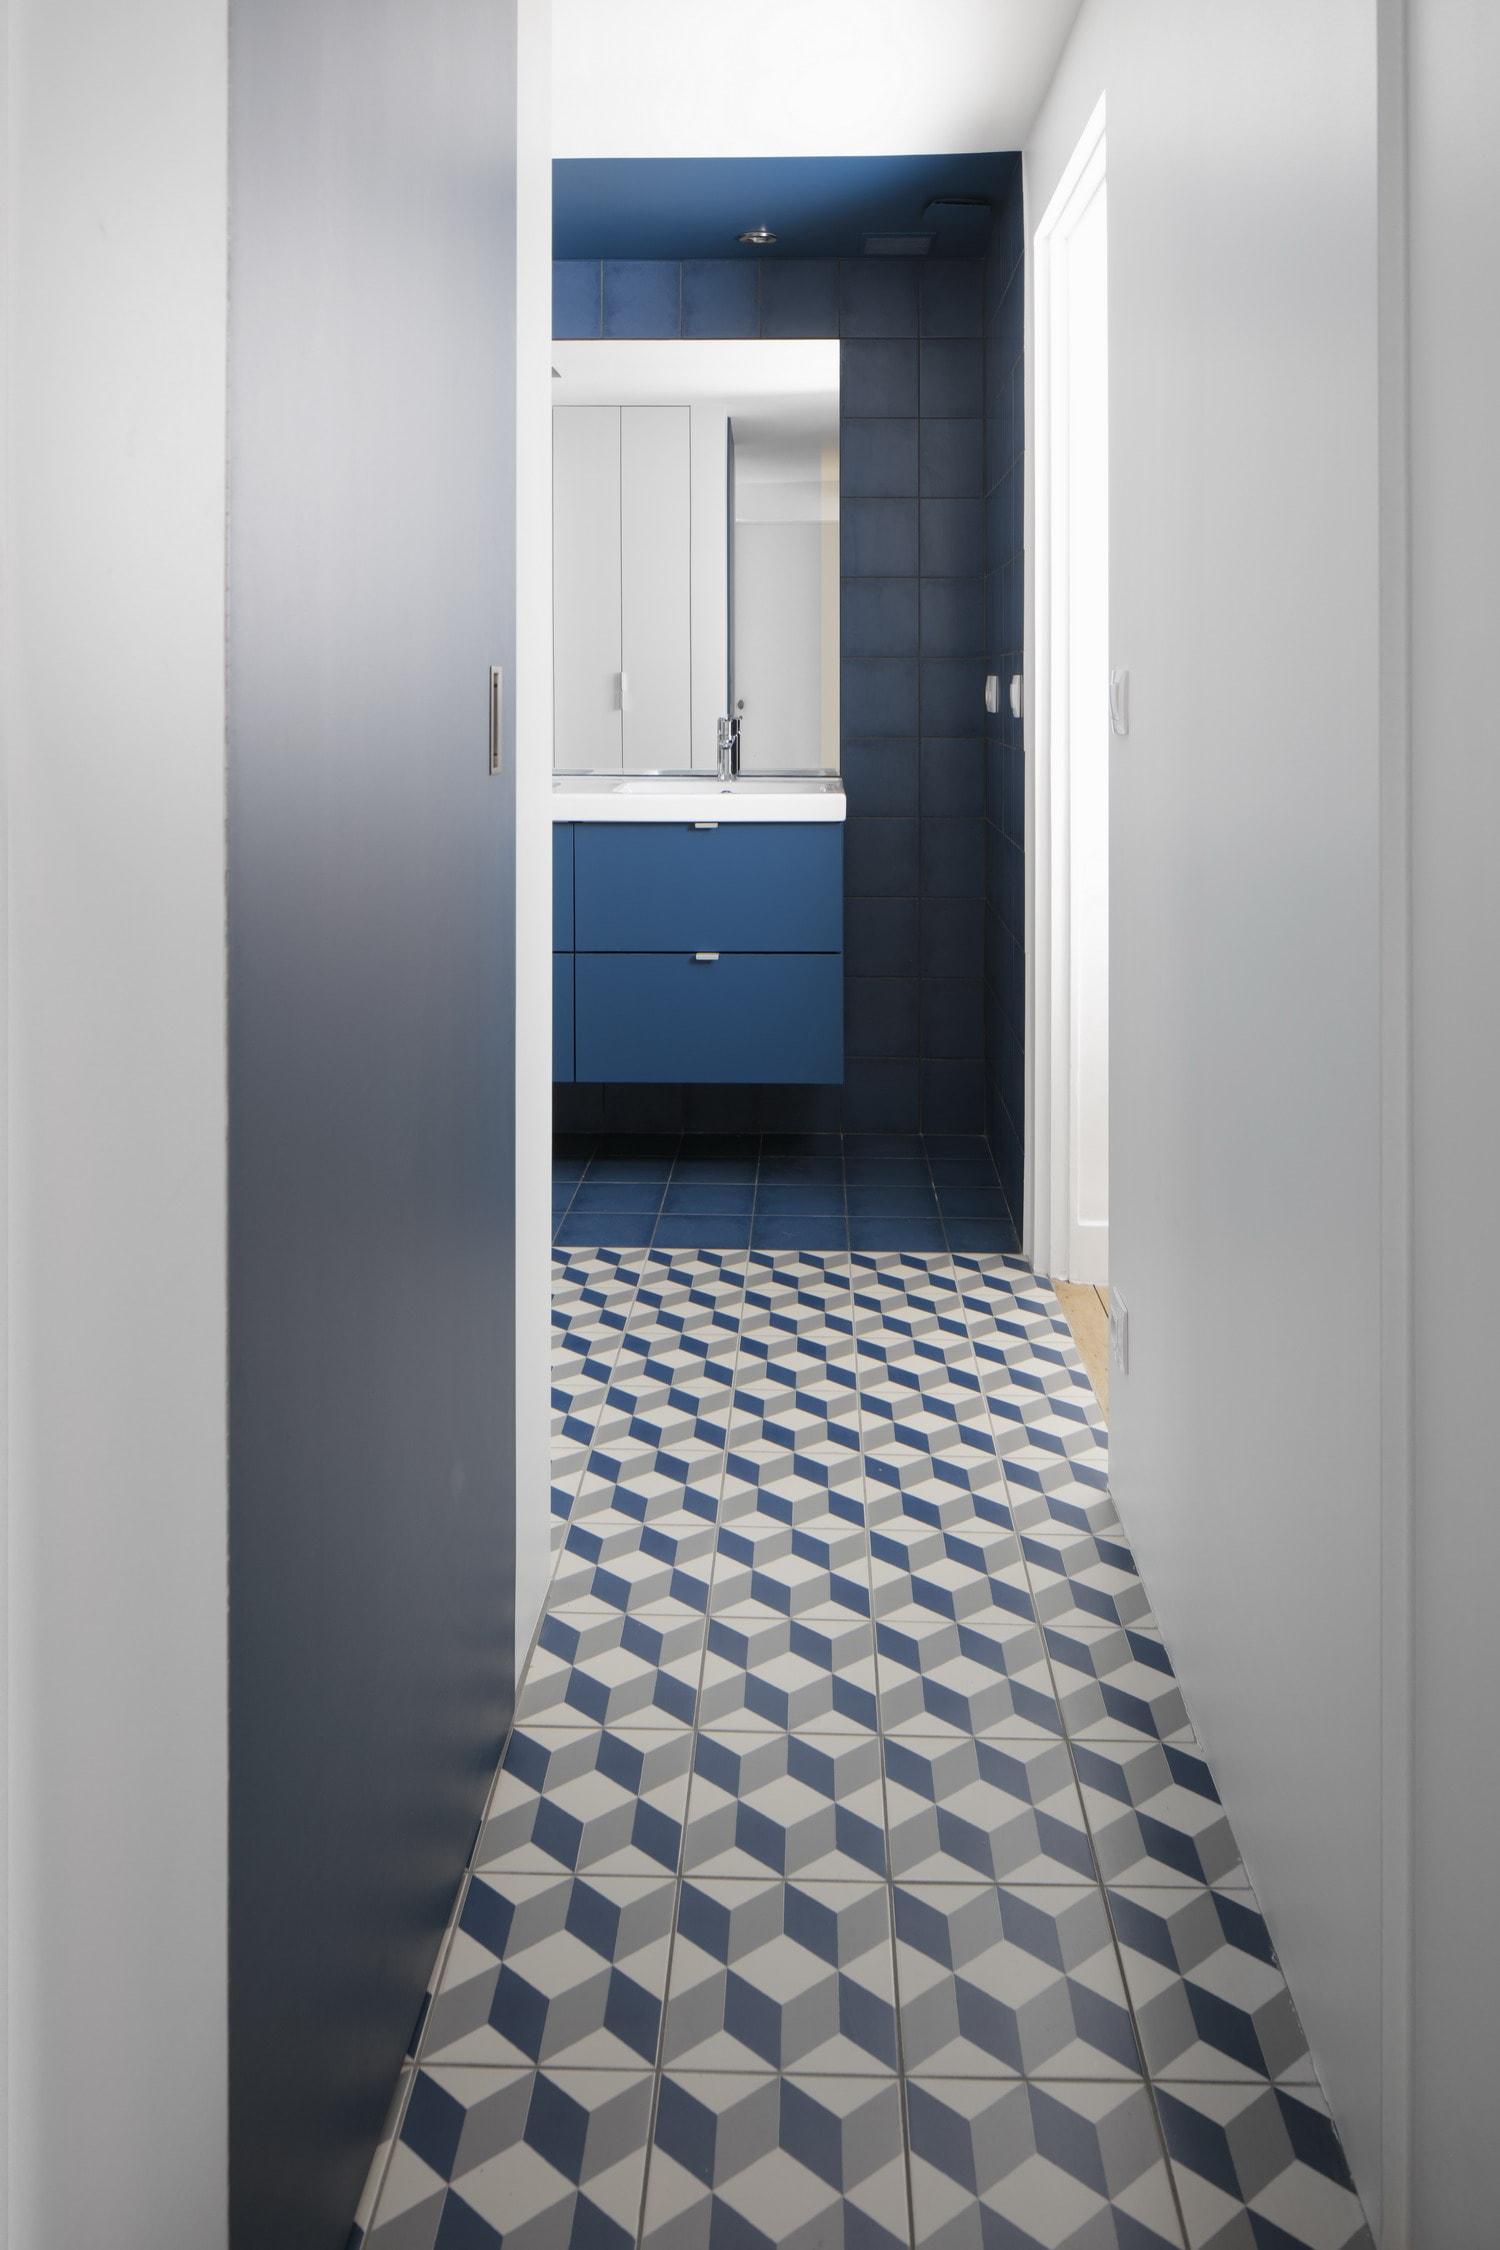 BKBS architectes ; salle de bain